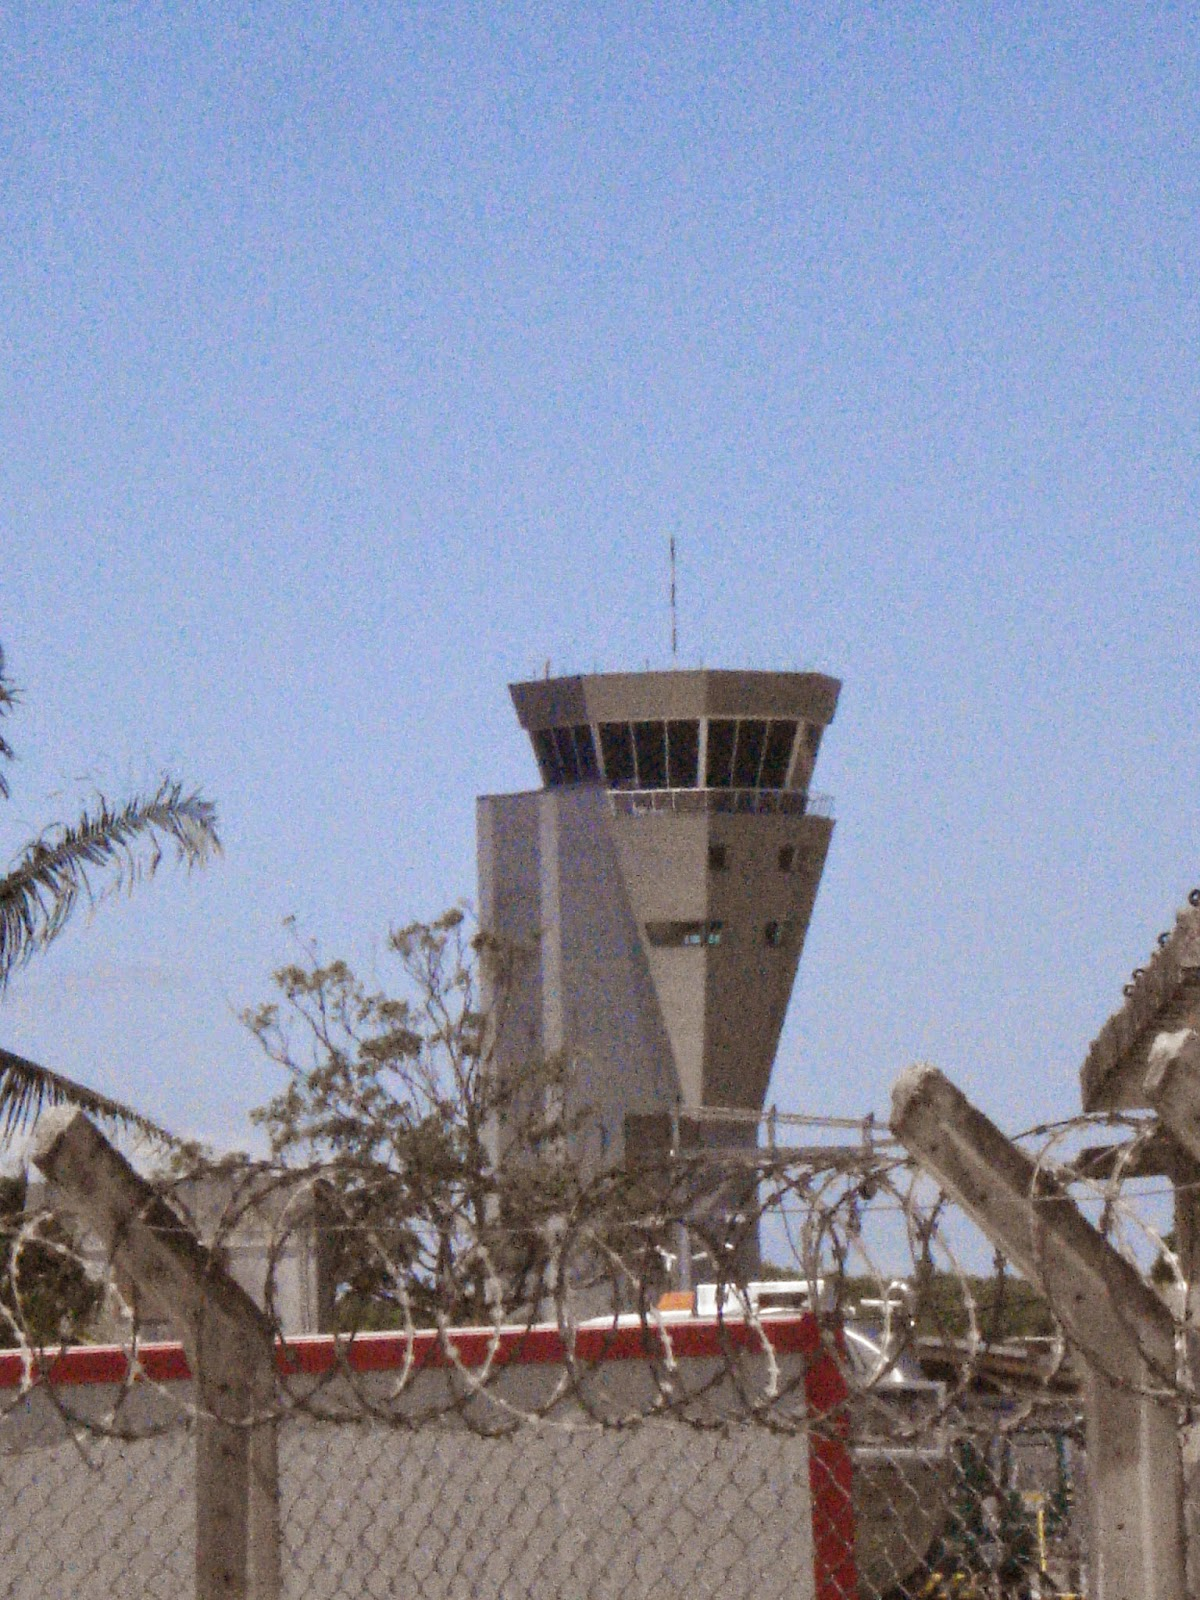 Aeroporto Vix : Aeroporto de vitória eurico aguiar salles vix my airplanes